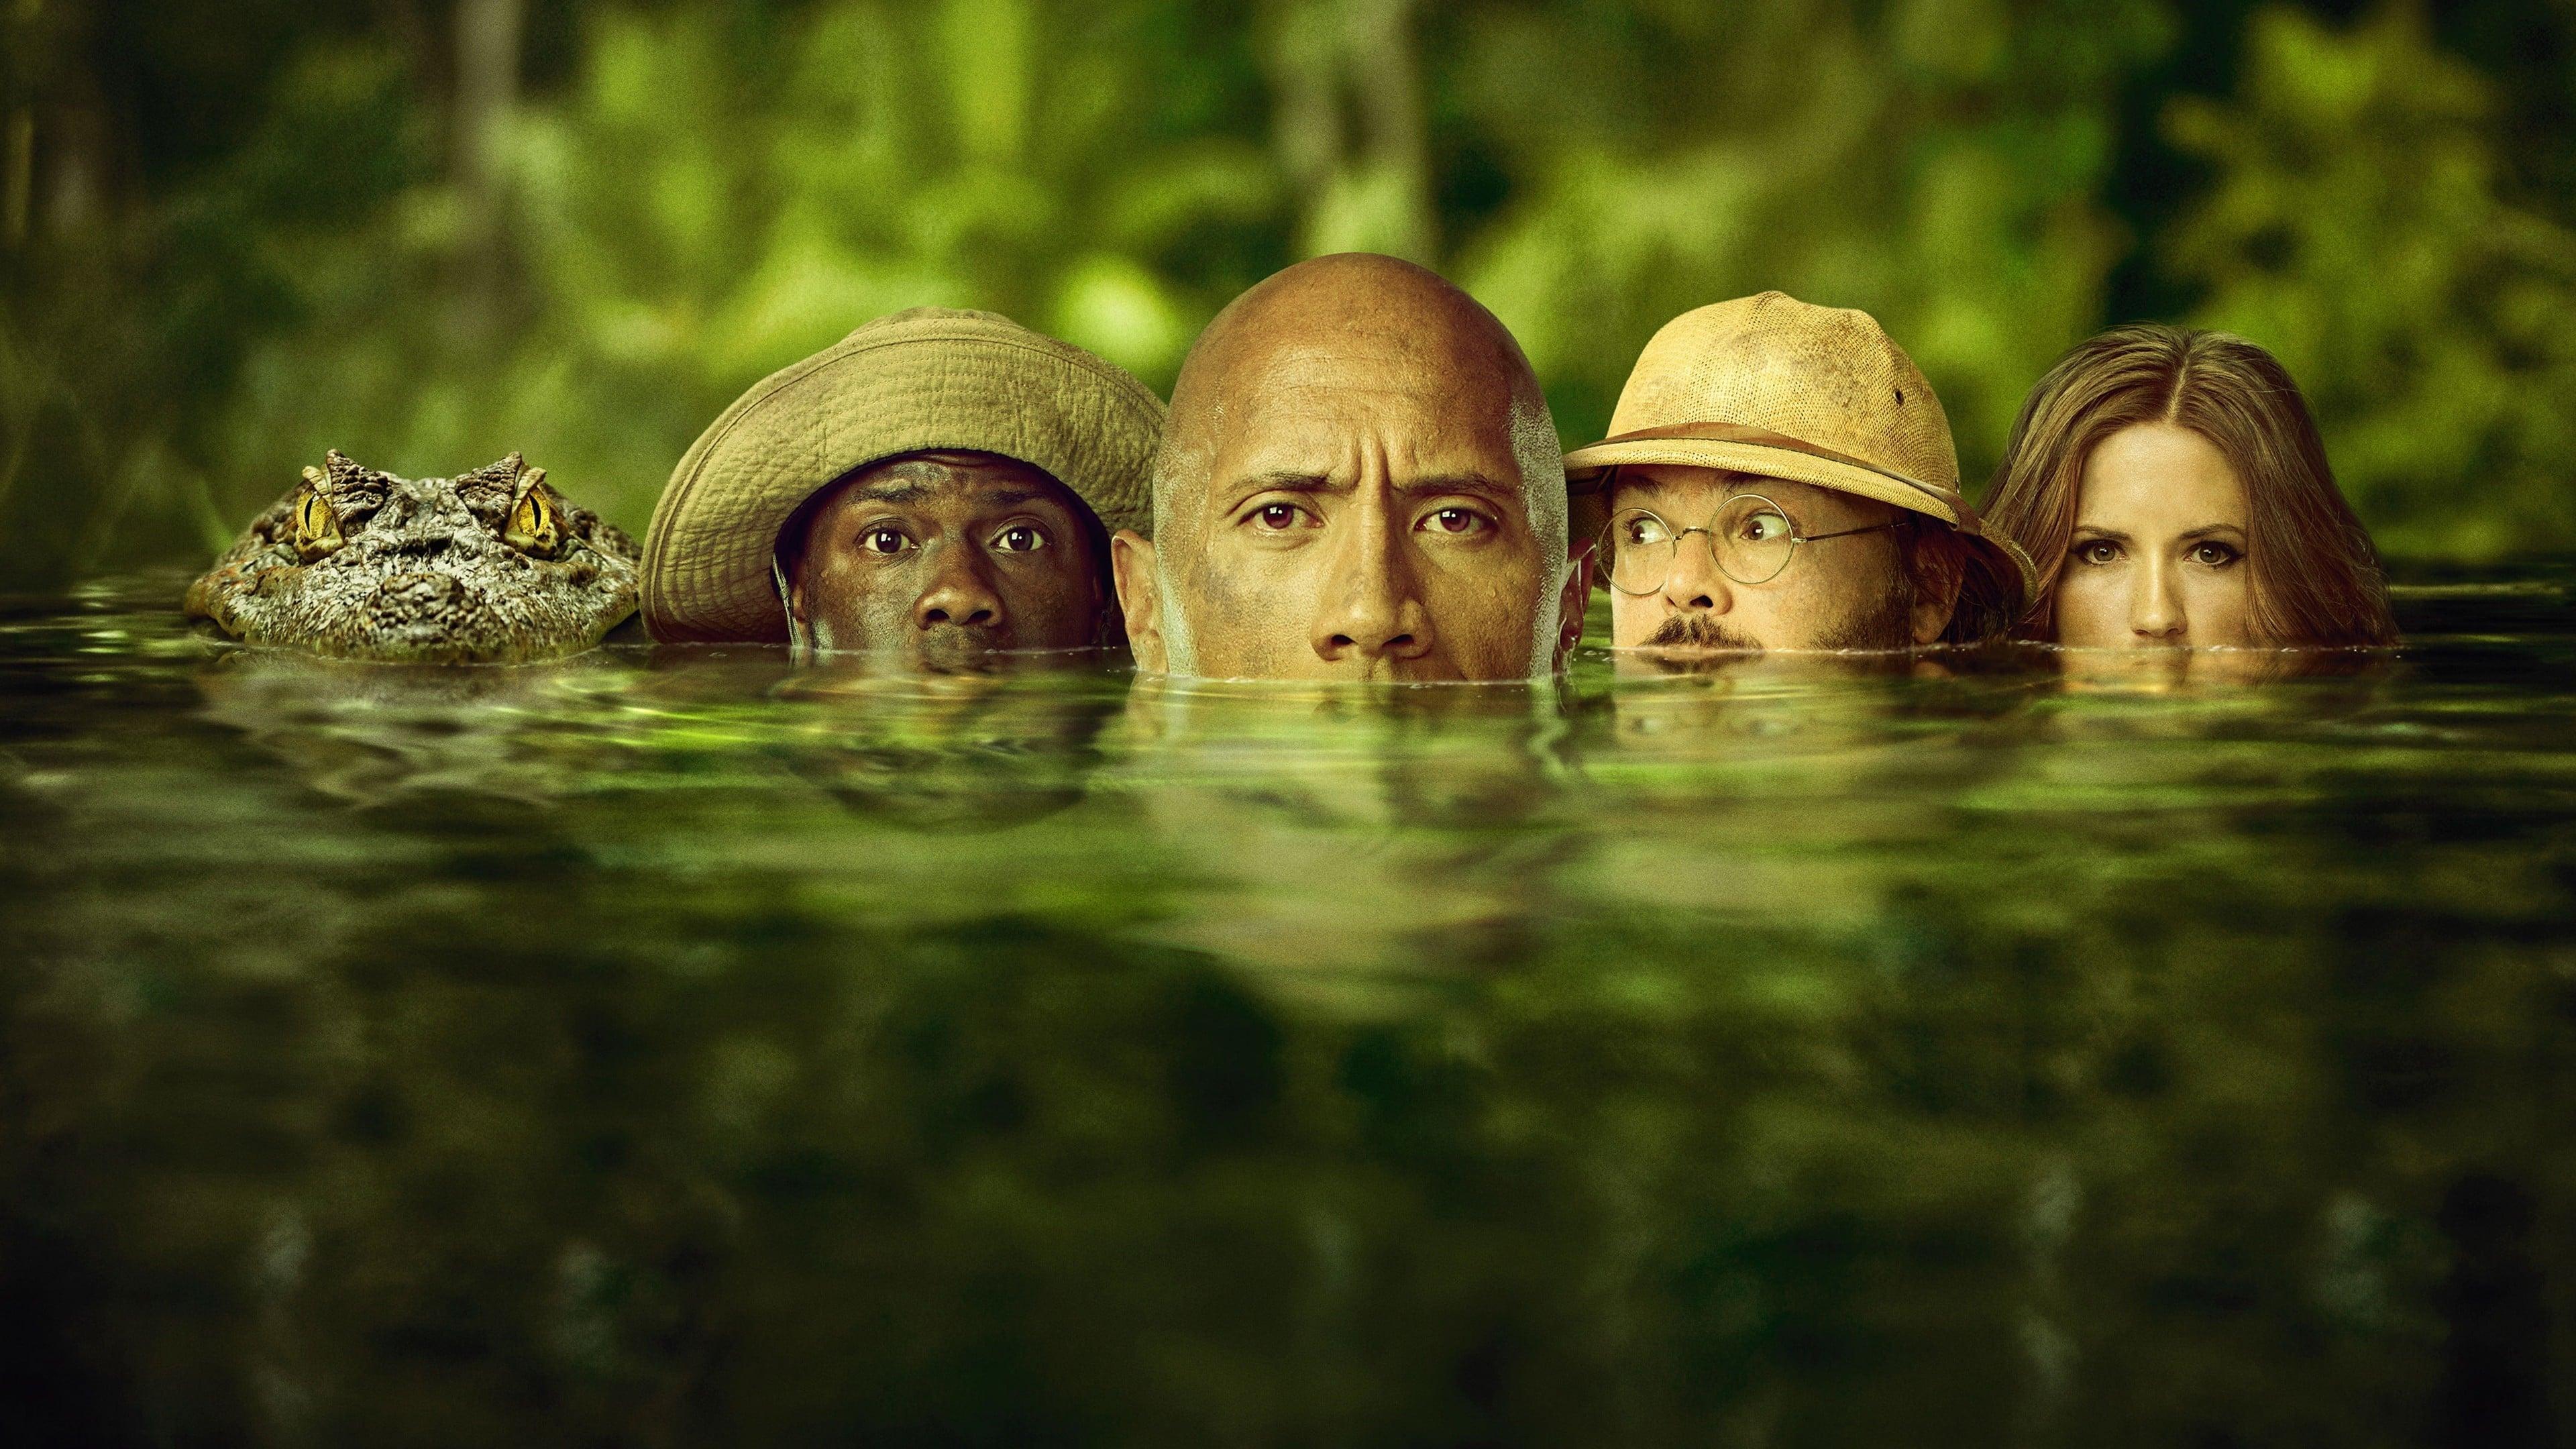 HD Streaming Jumanji: Welcome to the Jungle 2017 Full Length Movie